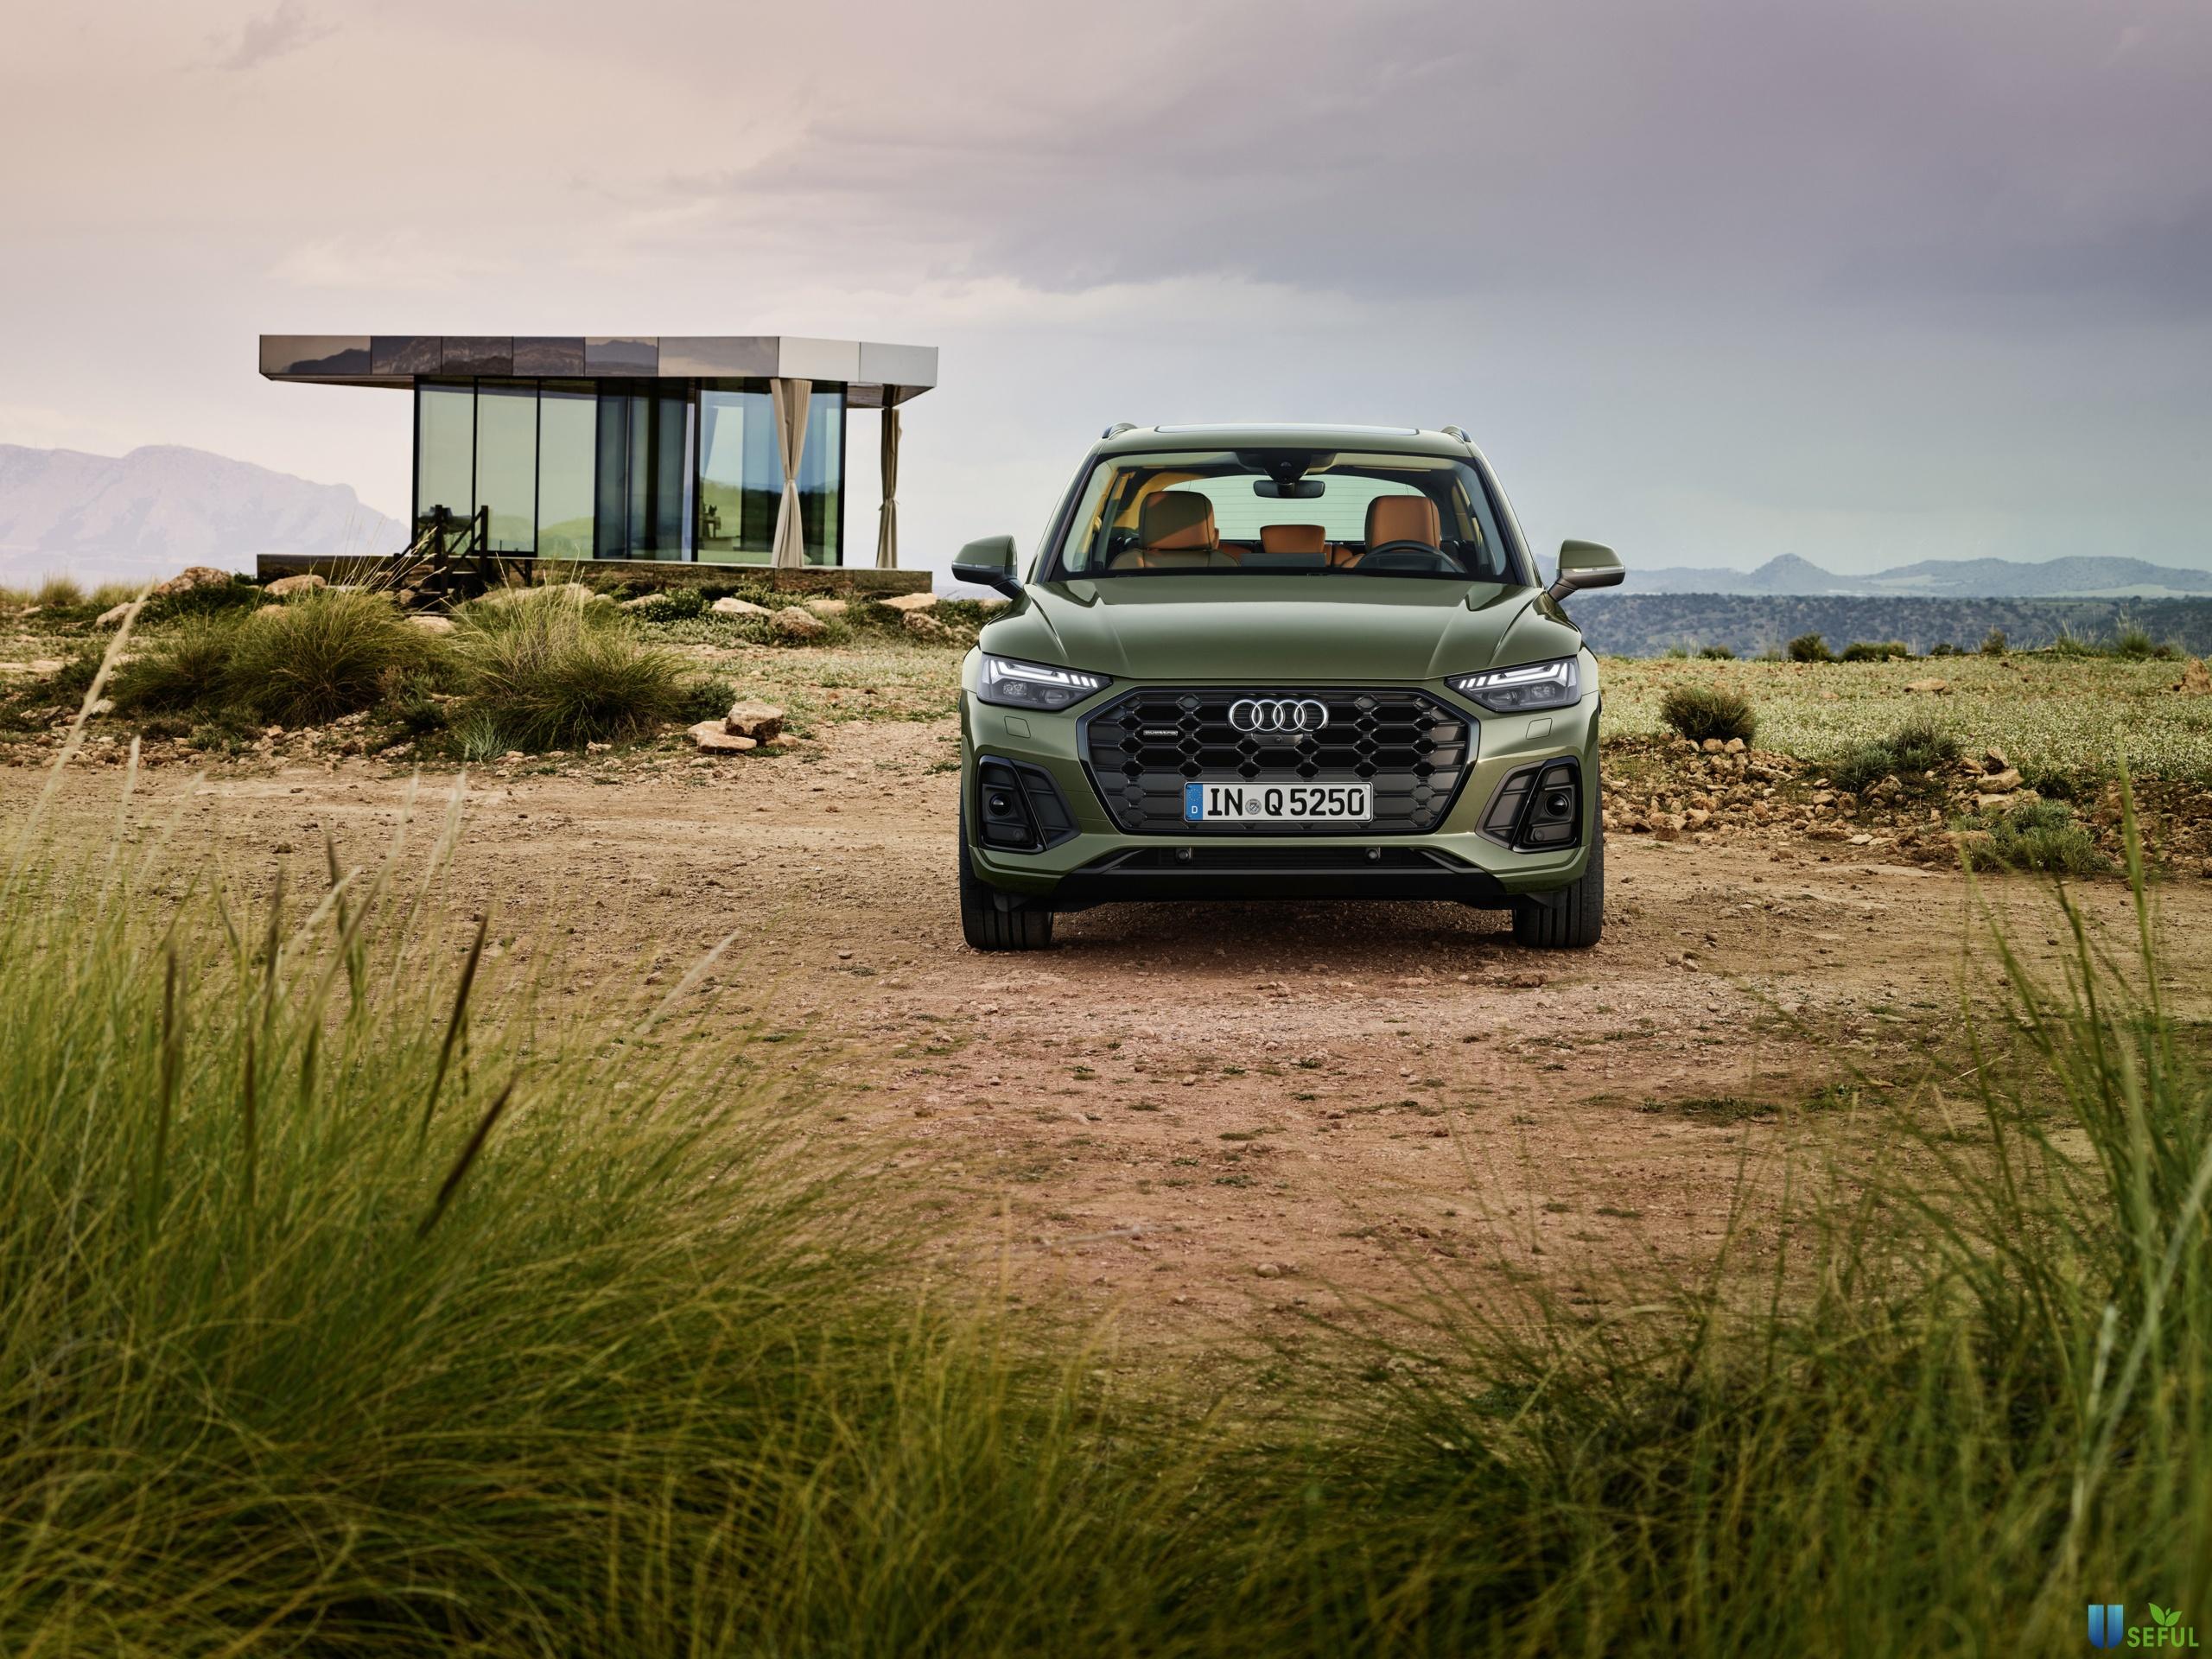 Audi renova Q5: frente muda, traseira estreia OLED – Observador